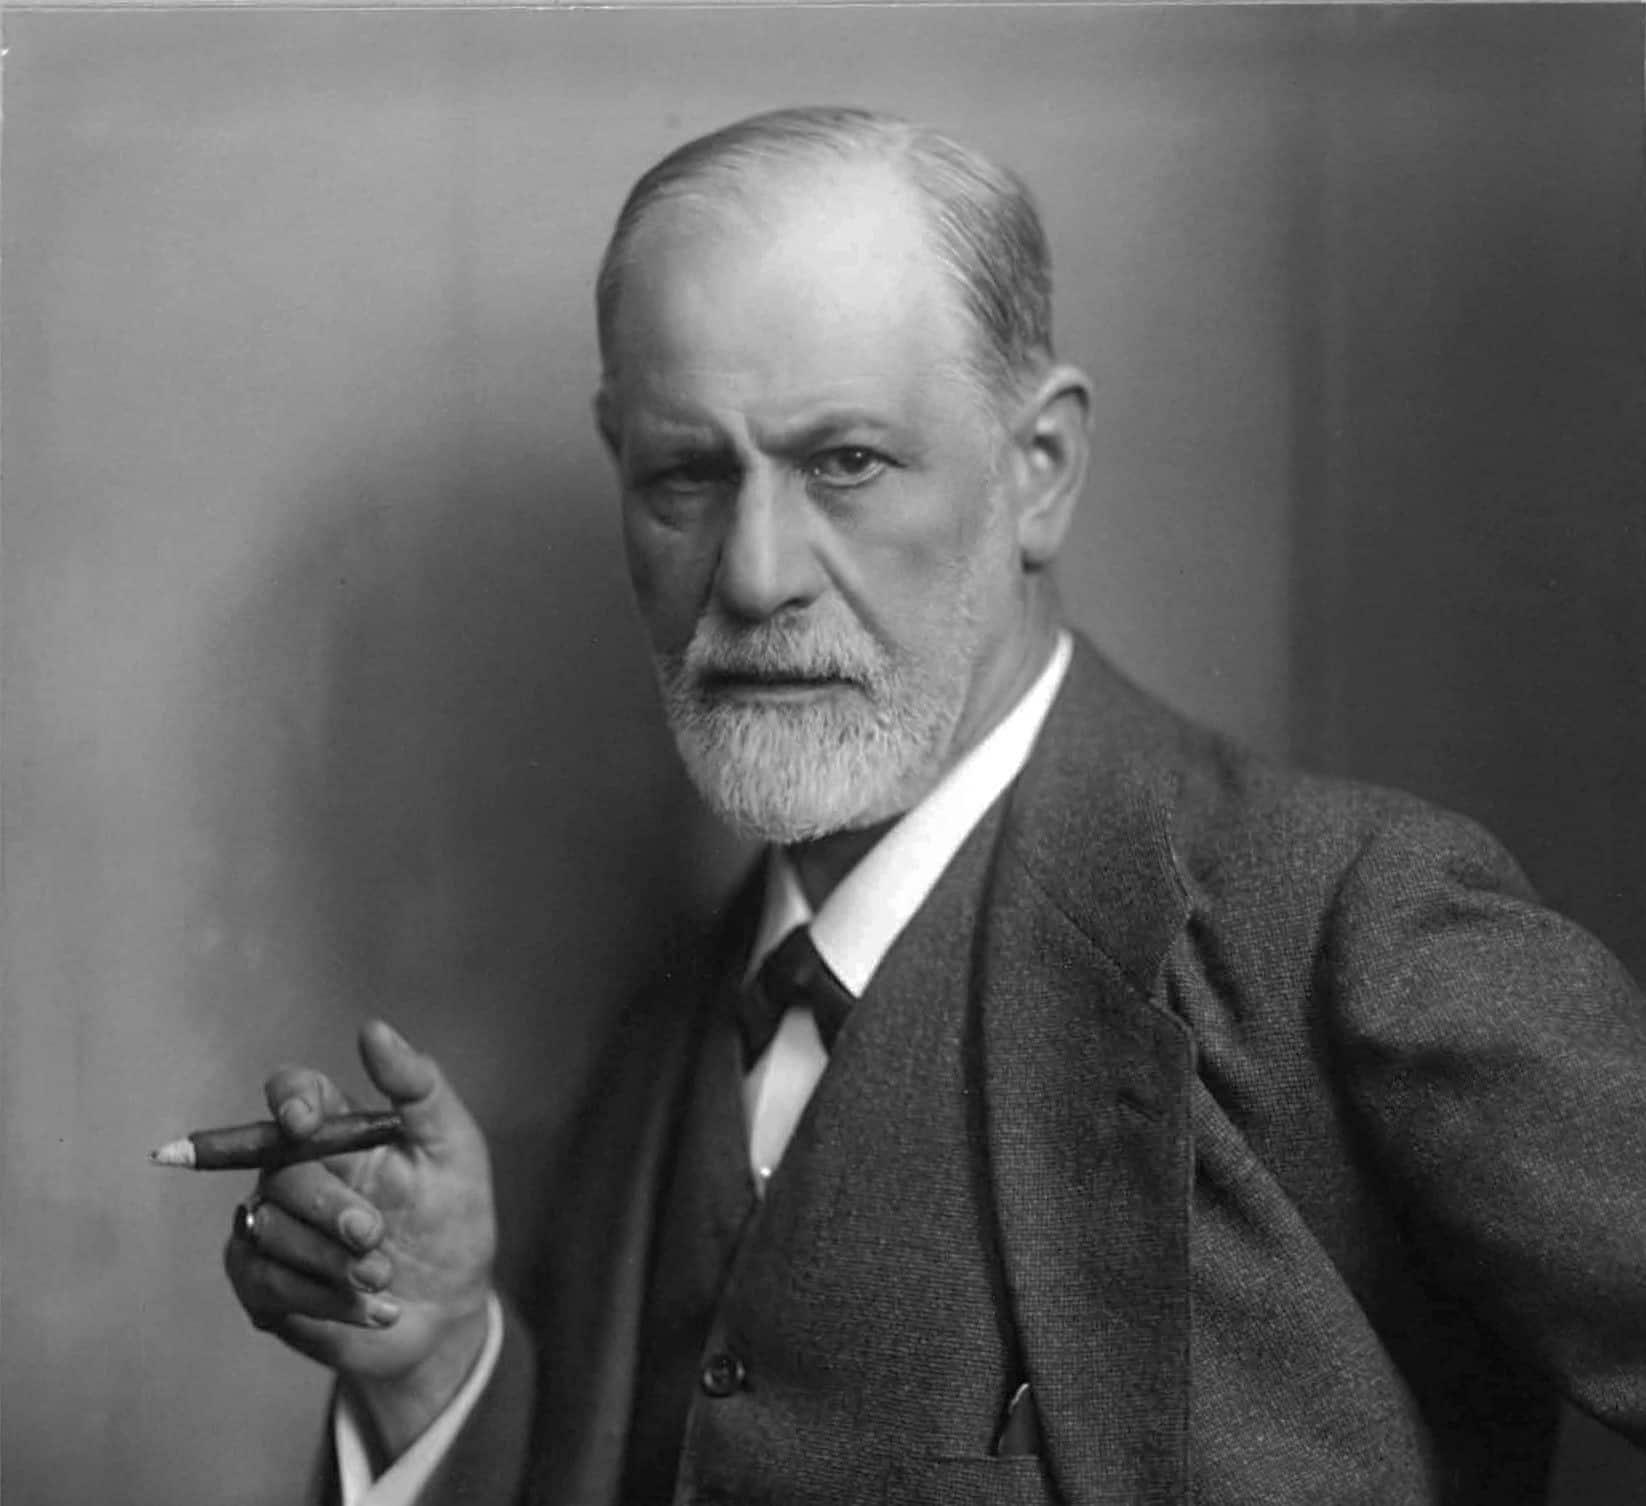 Sigmund Freud, Austrian founder of psychoanalysis